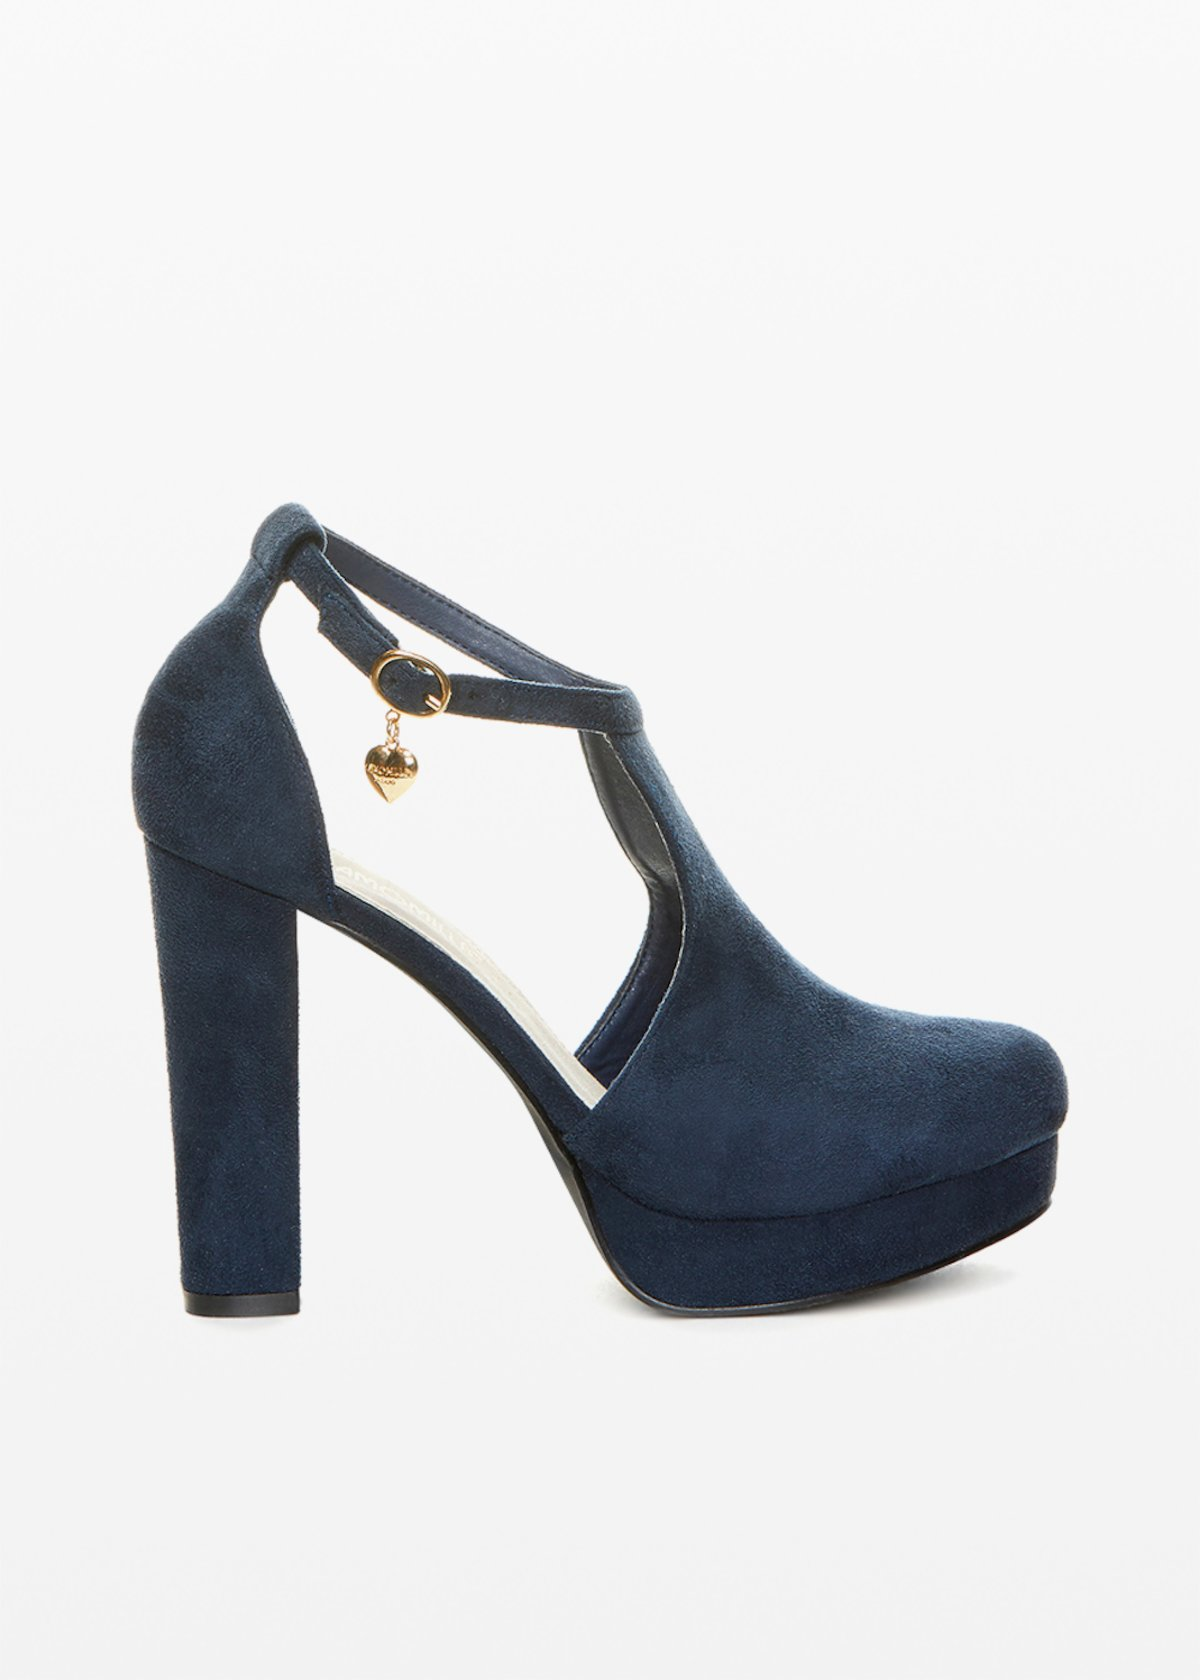 Sandalo Steila in ecosuede con plateaux - Medium Blue - Donna